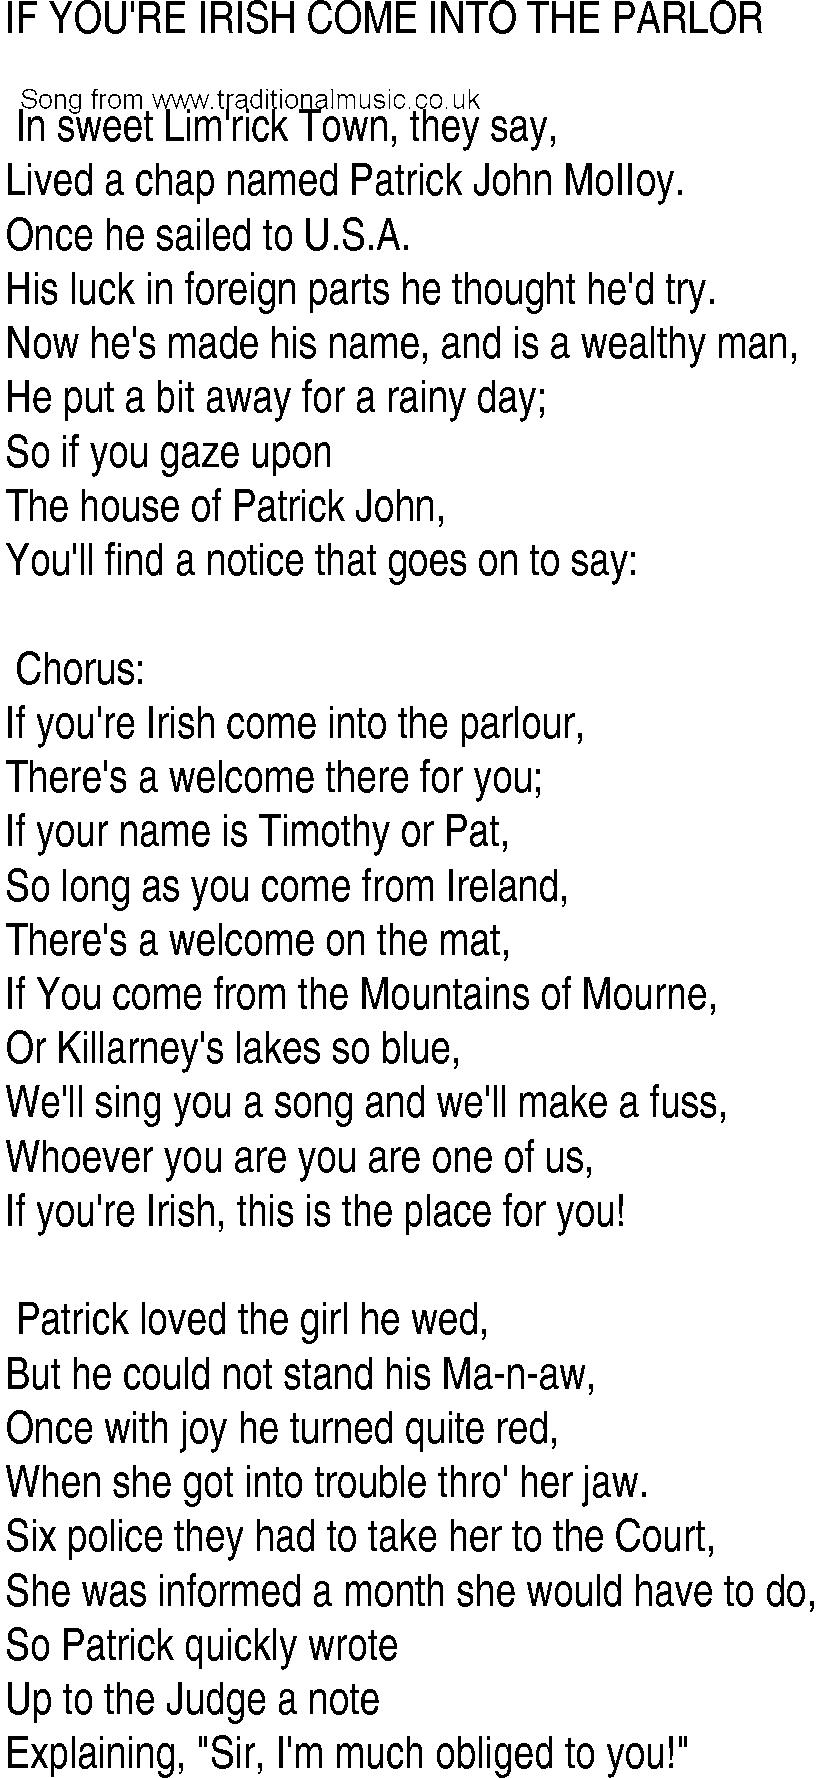 Irish Music Song And Ballad Lyrics For If You Are Irish